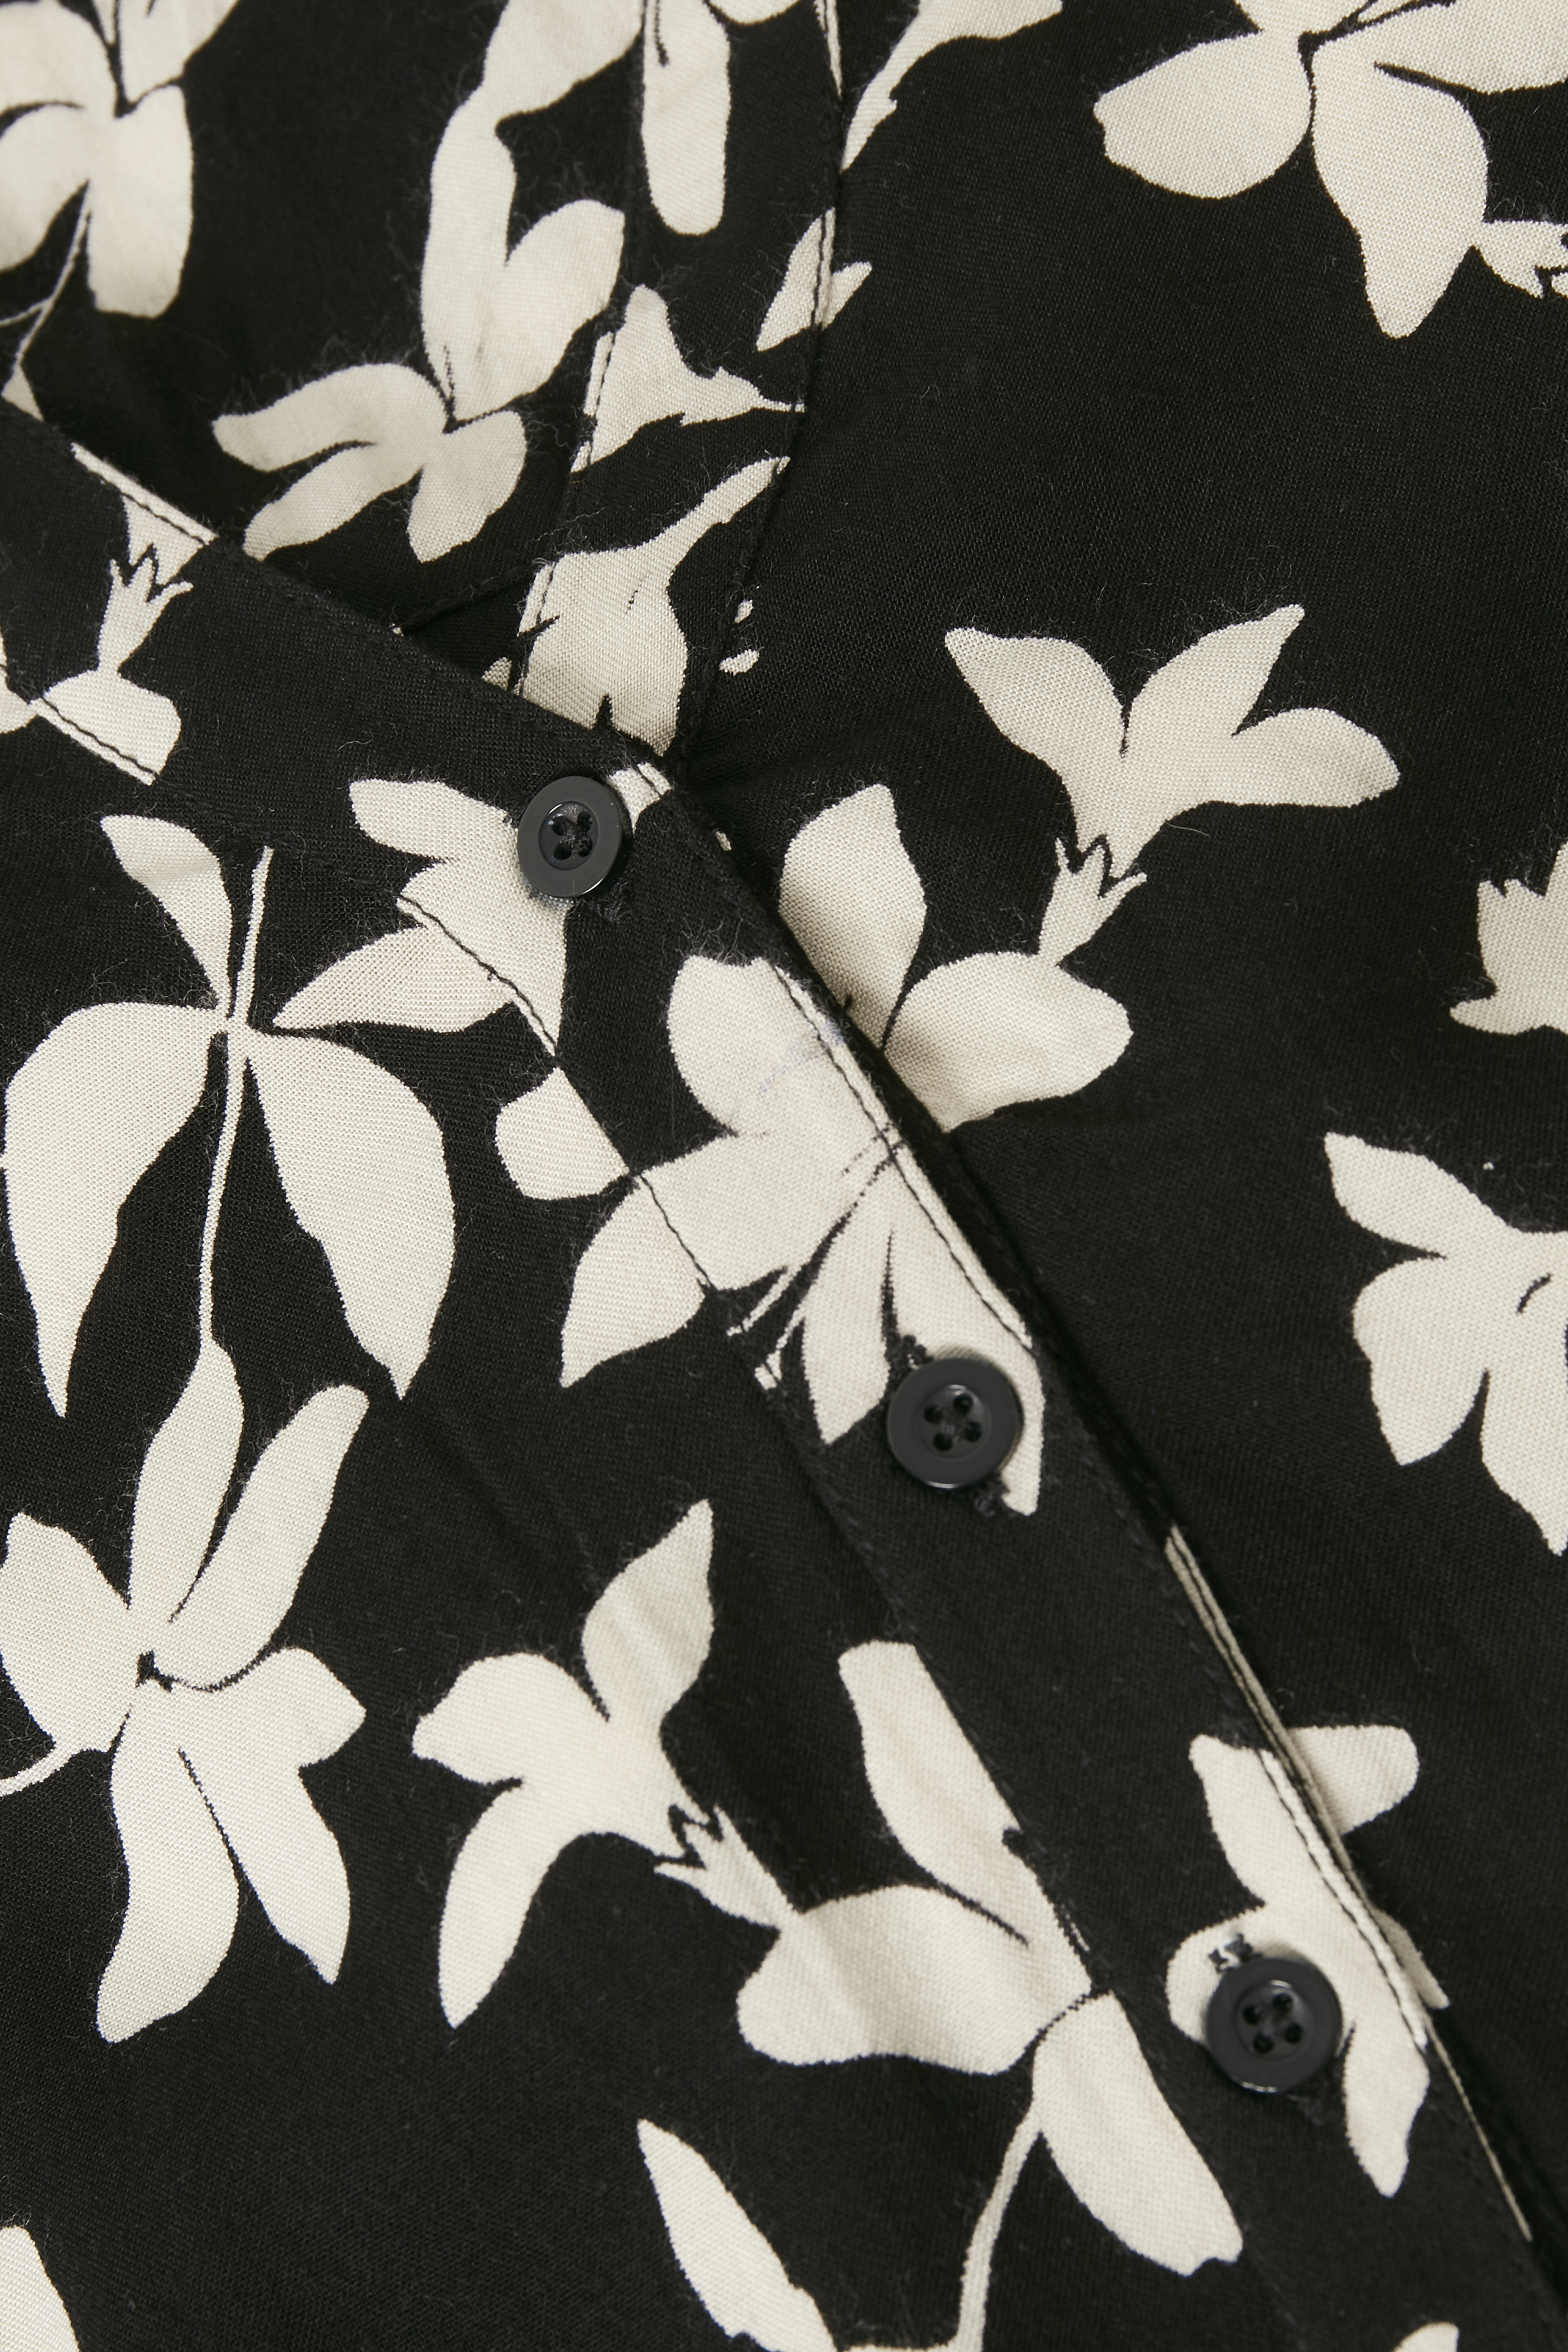 Off-white/svart Klänning från Bon'A Parte – Köp Off-white/svart Klänning från stl. S-2XL här